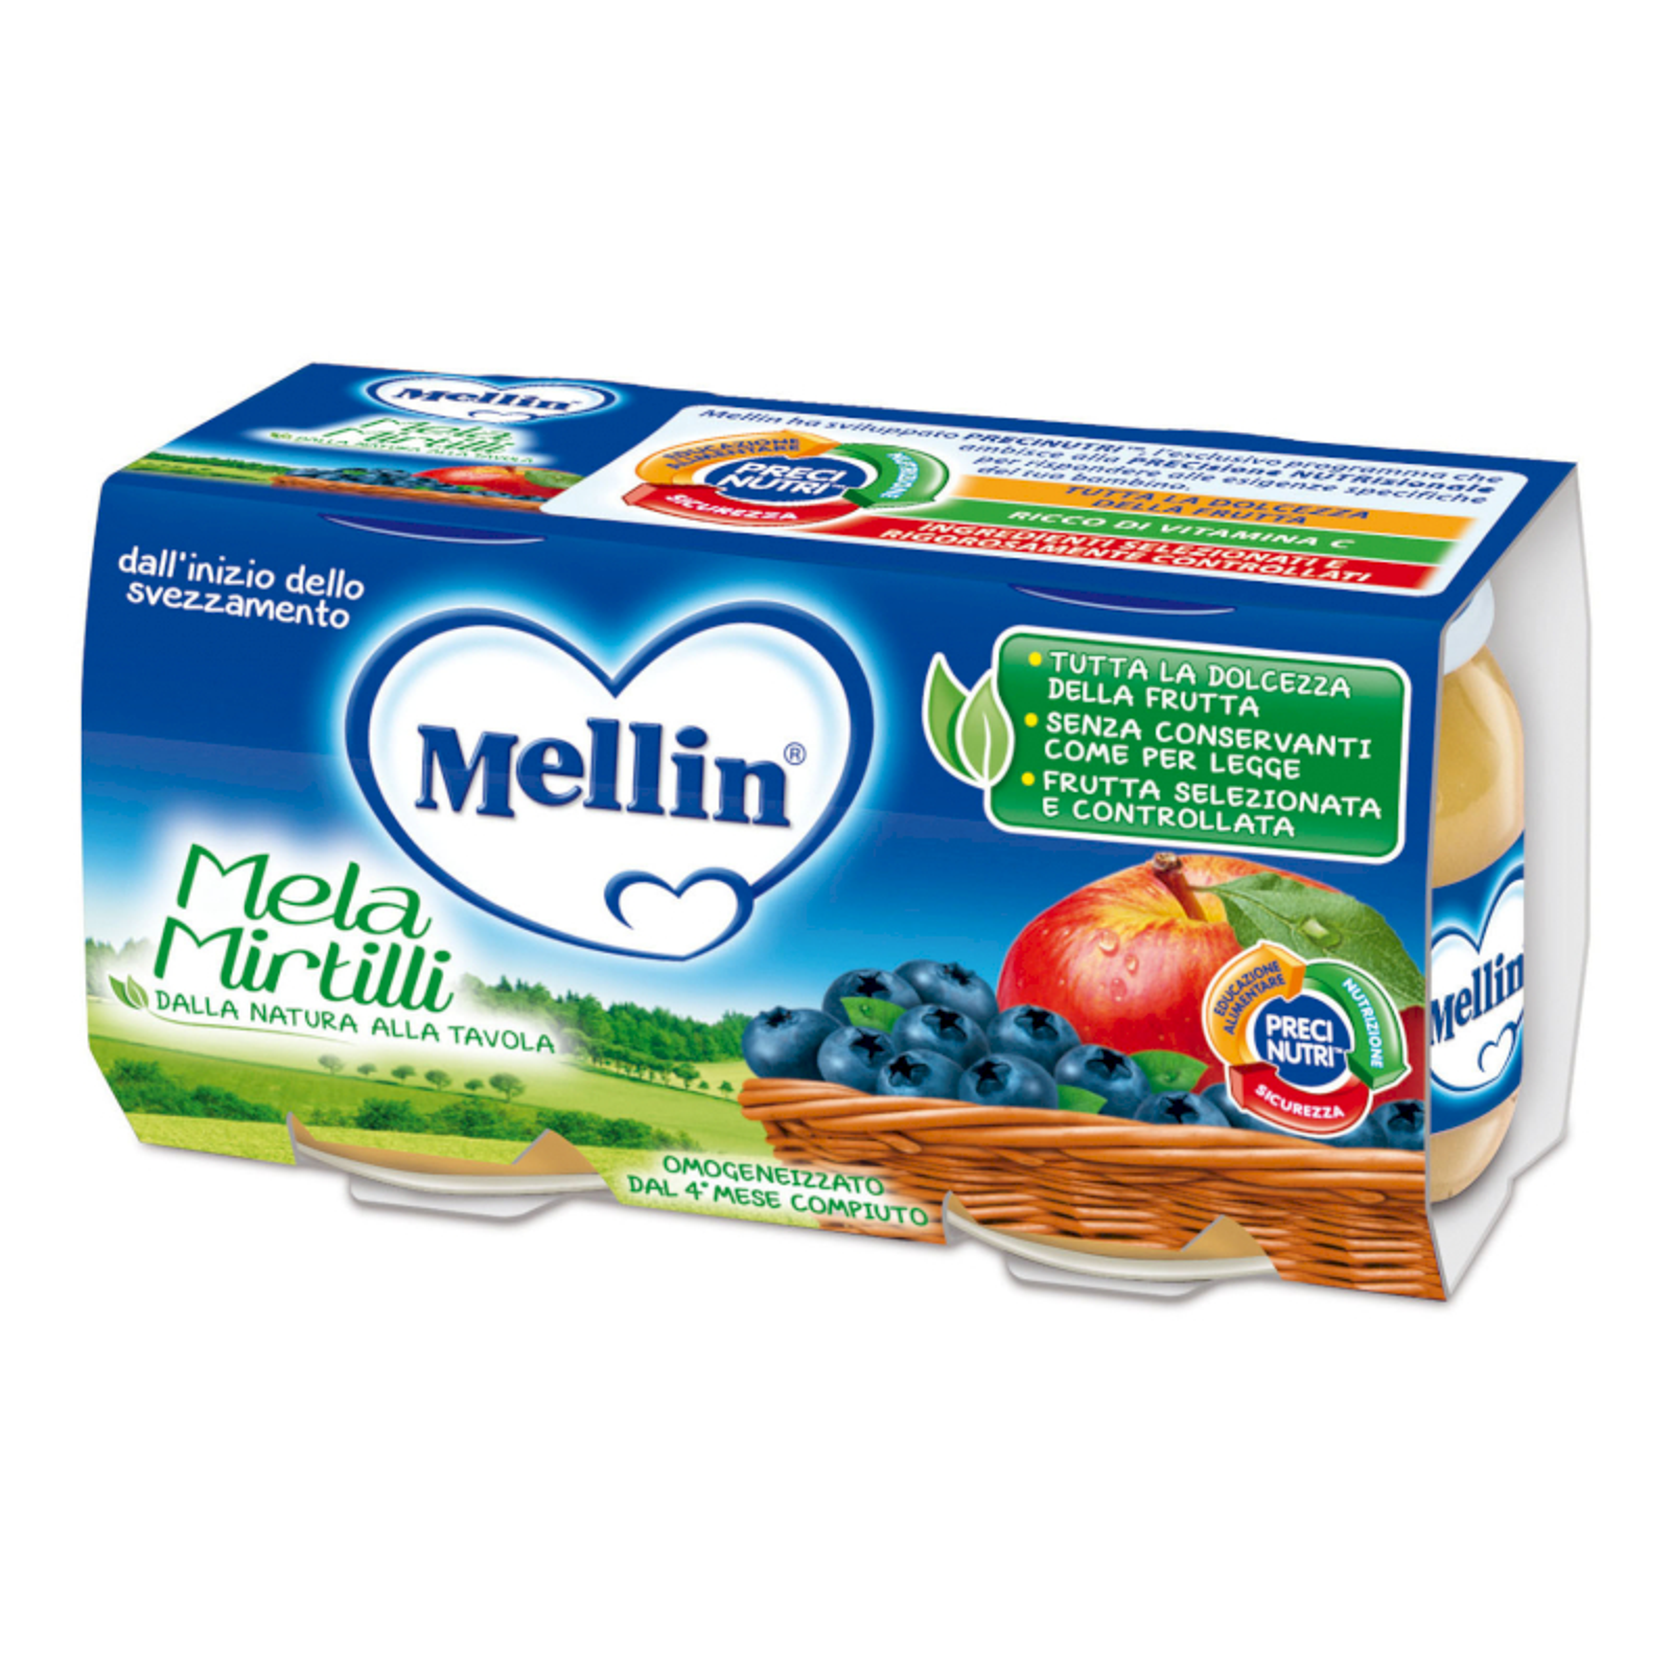 Omogeneizzato Mela Mirtilli Mellin